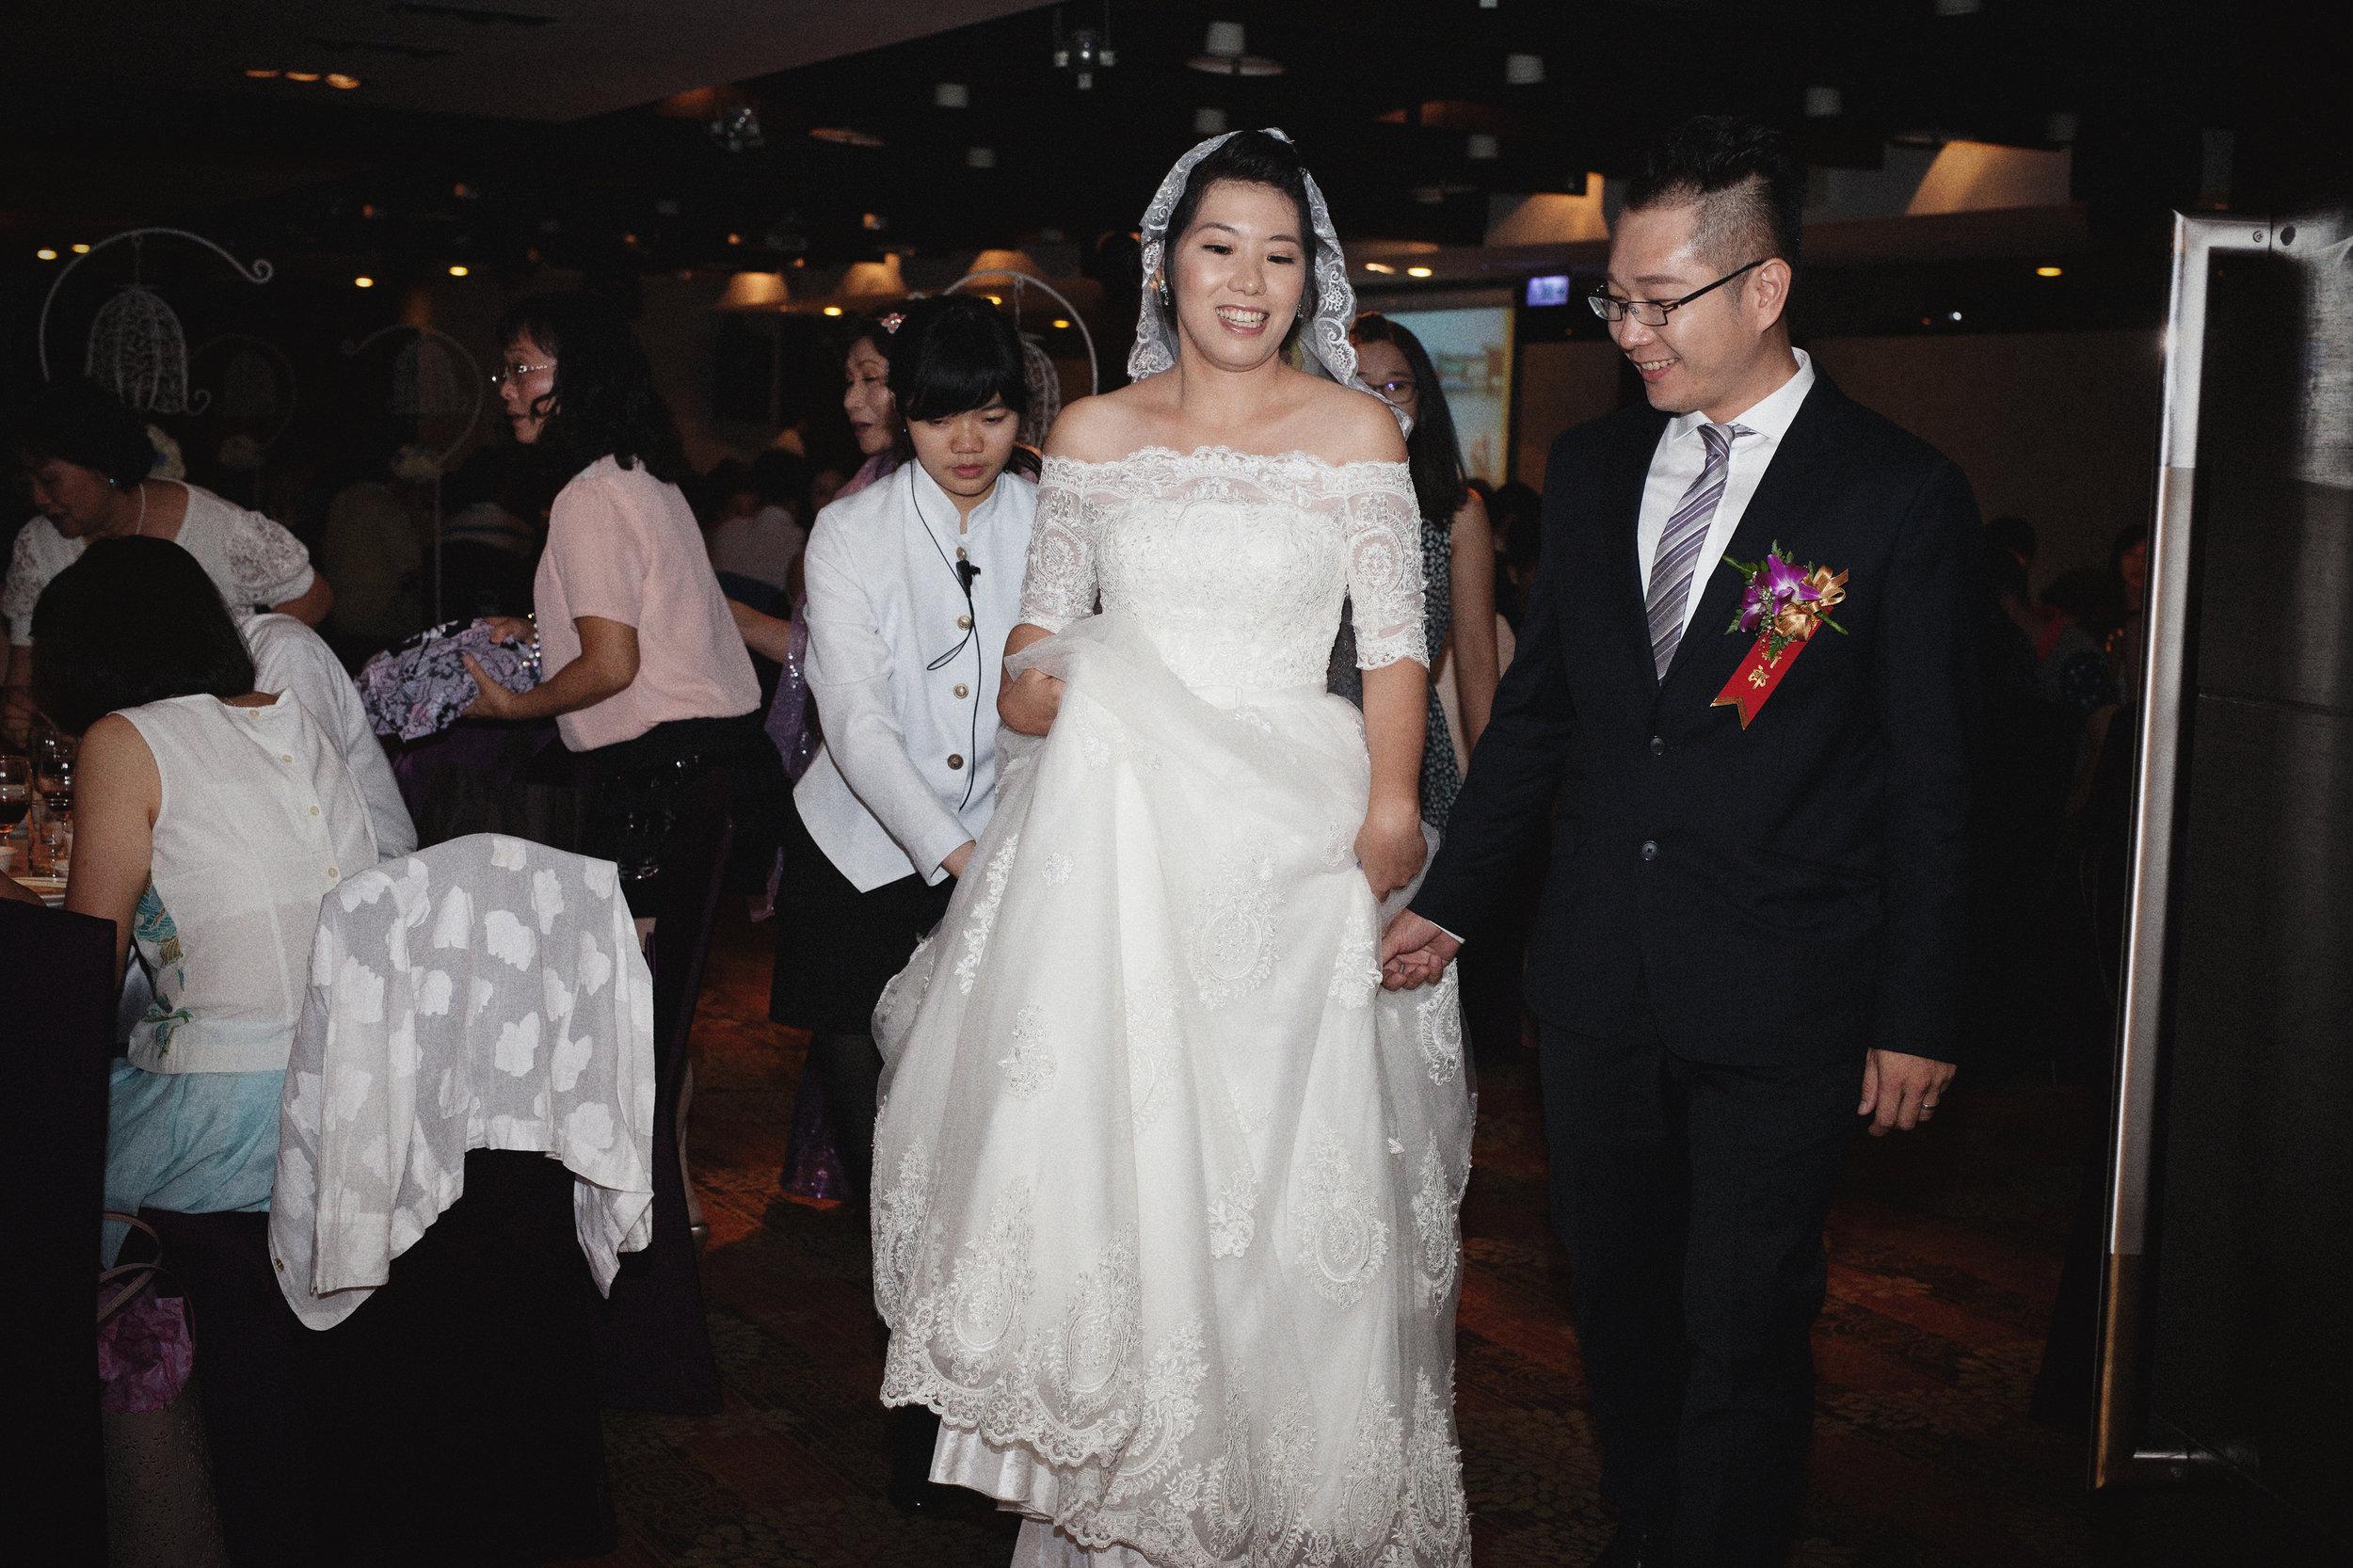 [JC]CREATIVE 女性攝影師 北投儷宴會館 補請台灣WEDDING    自然風格 台北婚攝推 女婚攝  桃園婚攝   圖像00193.JPG